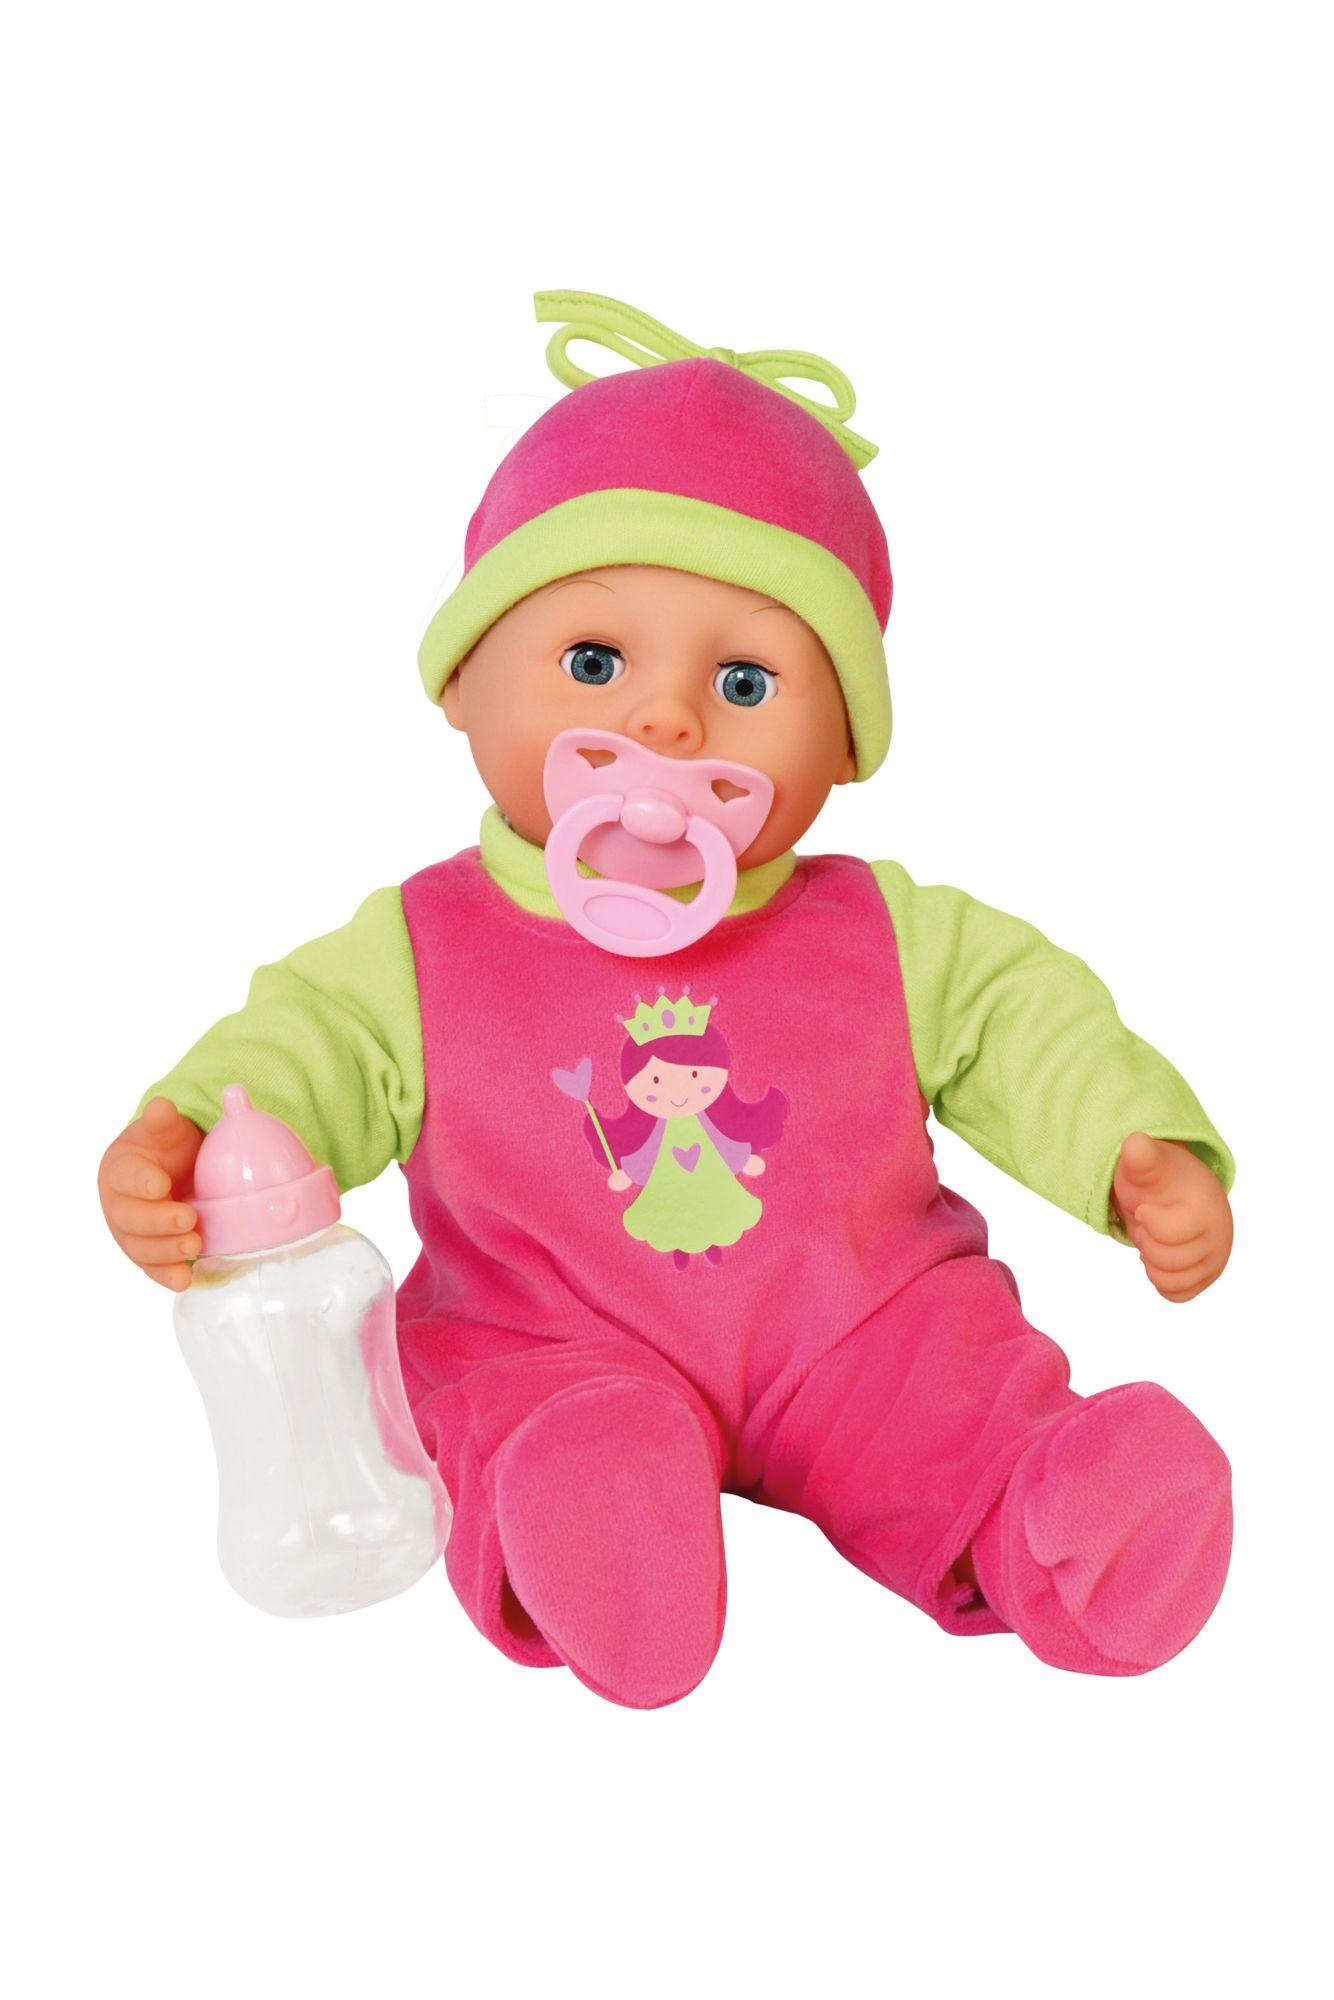 BAYER Bayer Design Babypuppe, »First Words«, pink